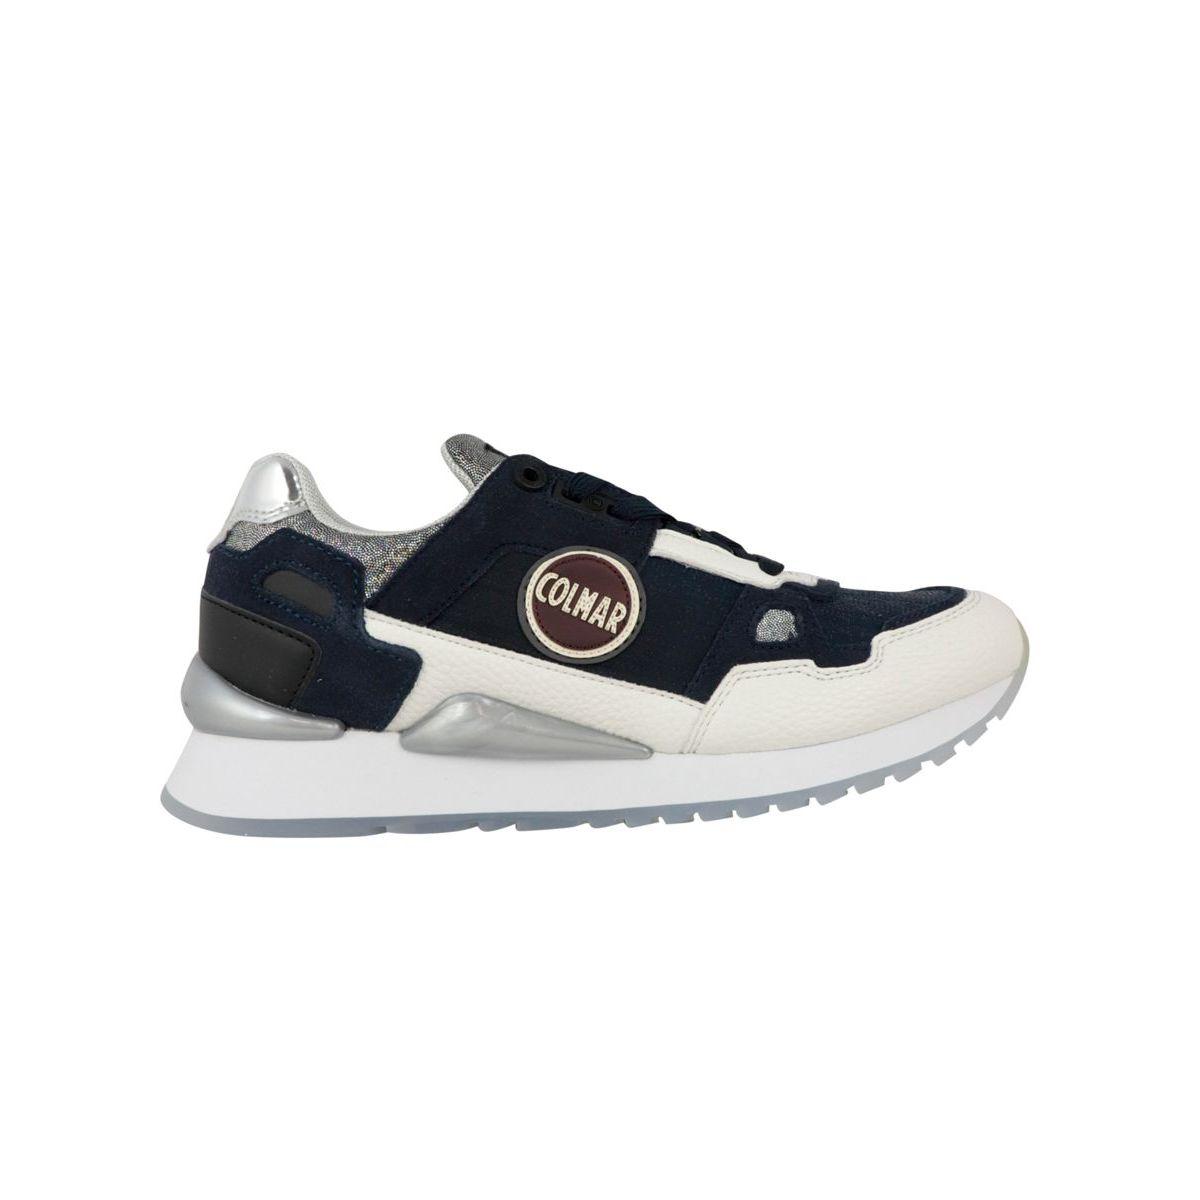 Tayler bi-material sneakers with metallic details Blue / silver Colmar Shoes